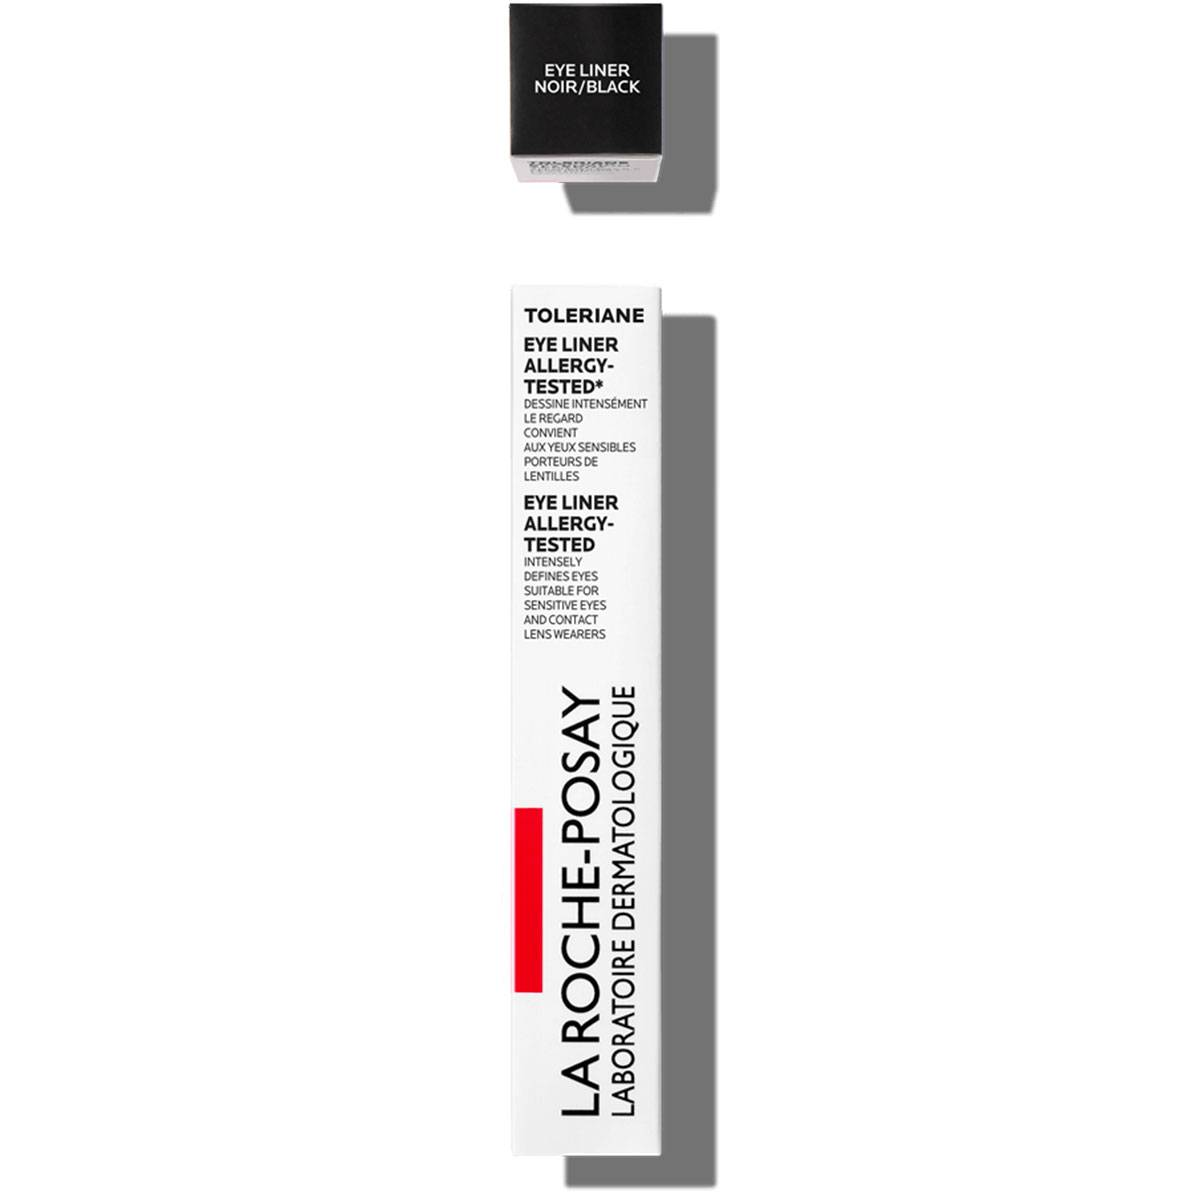 La Roche Posay Sensitive Toleriane Make up EYELINER_Black_343342240304